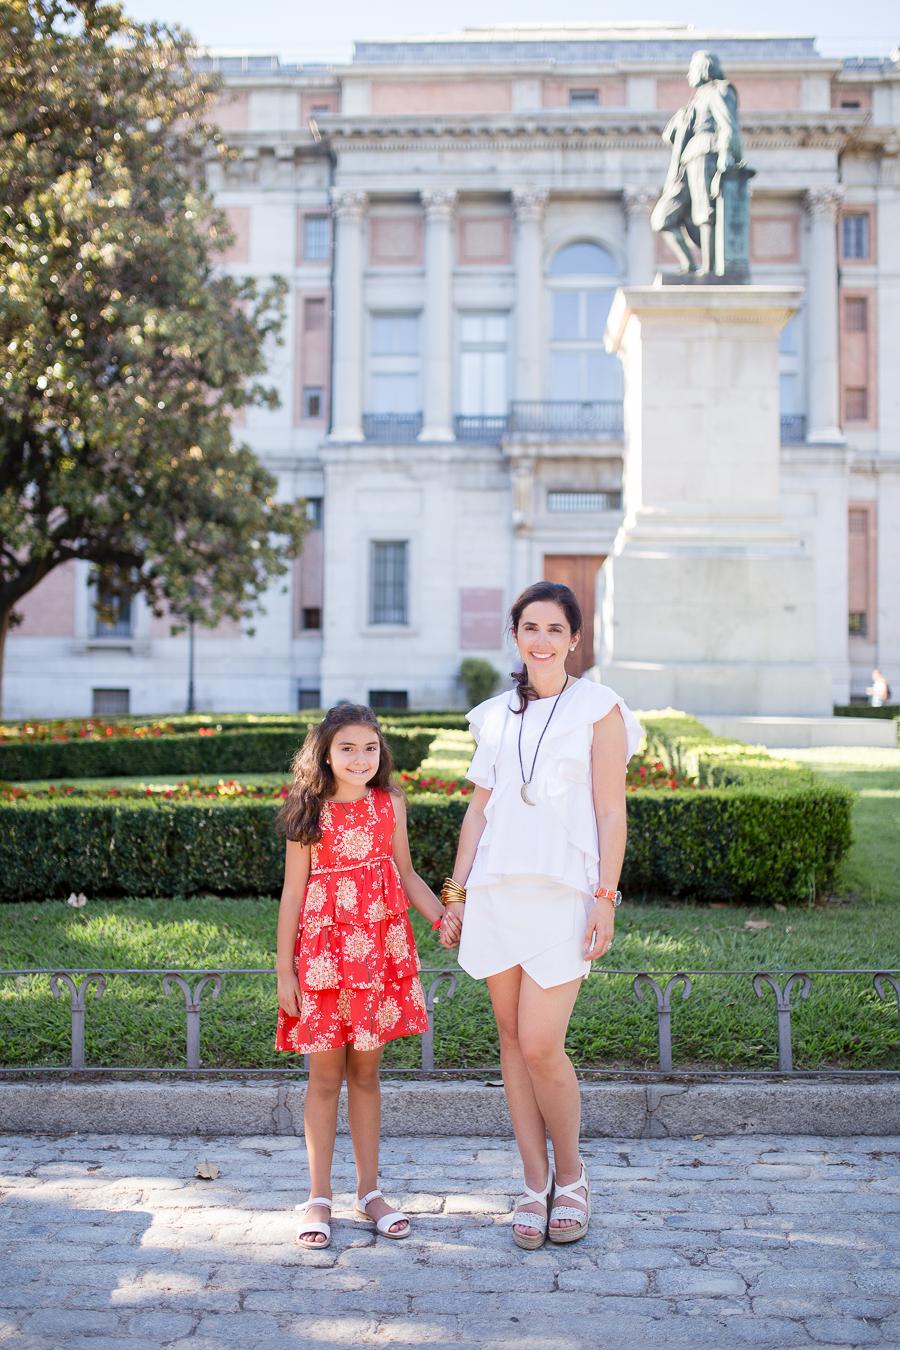 el-prado-madrid-mother-daughter-photo-session_004.jpg